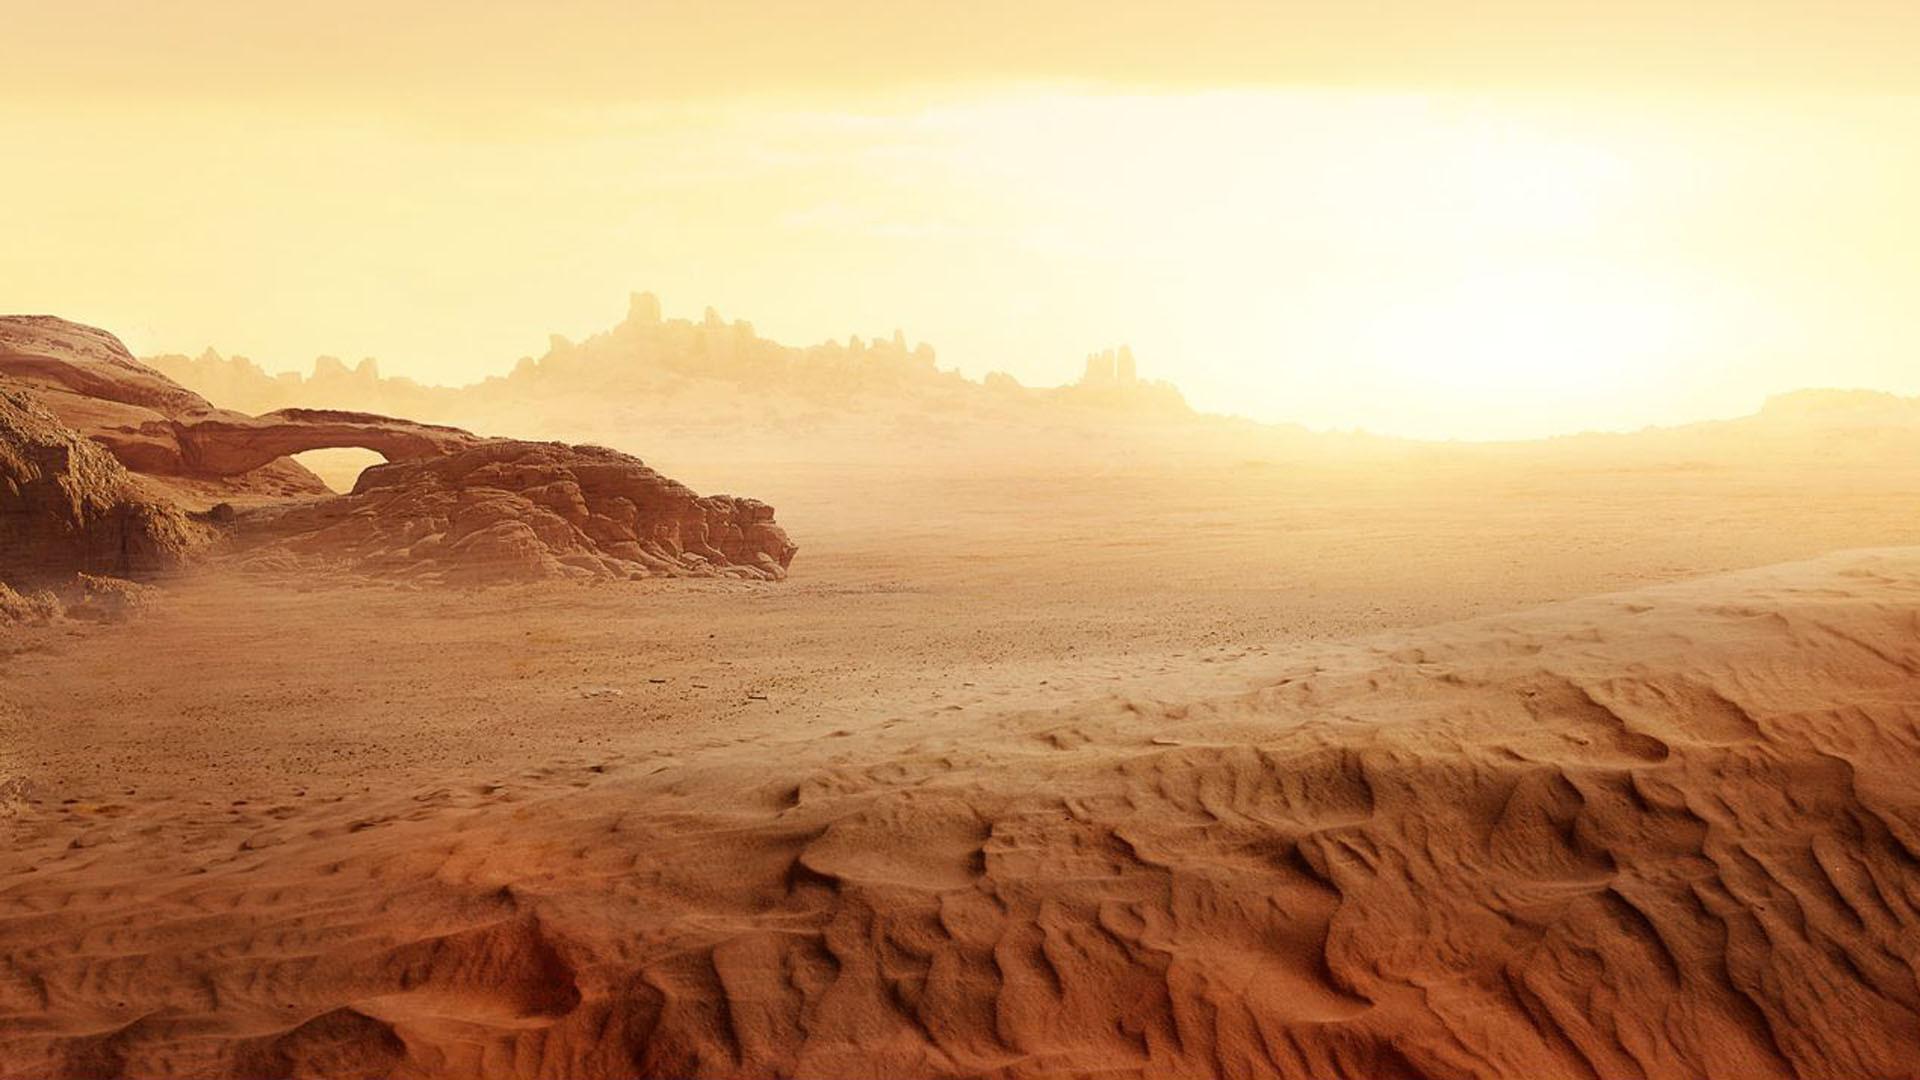 Frank Herbert's Dune backdrop / wallpaper 2